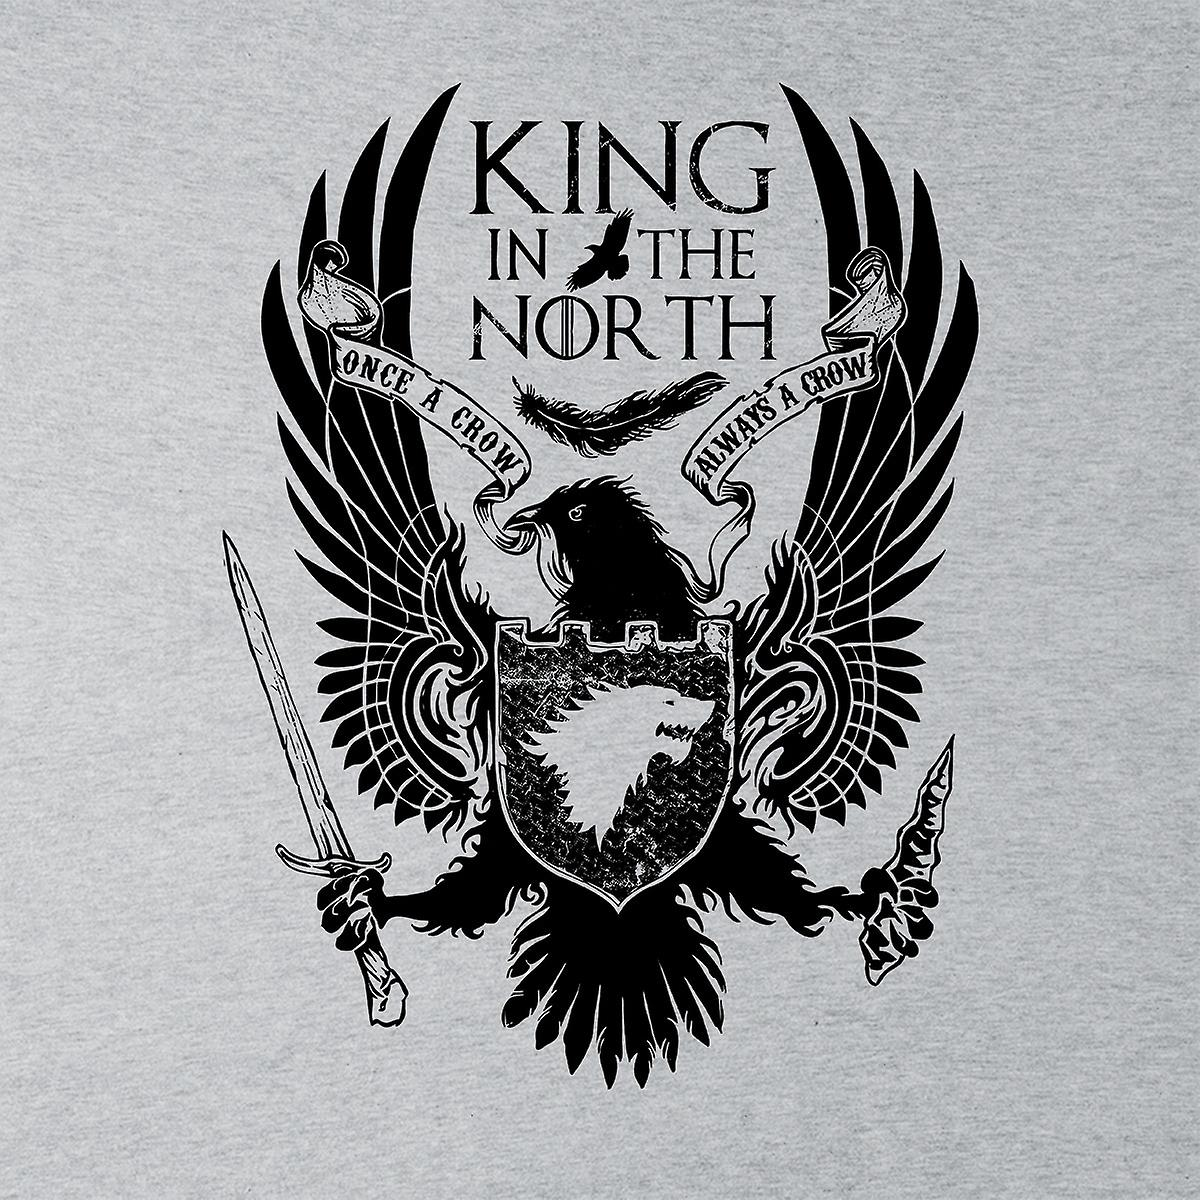 könig game of thrones